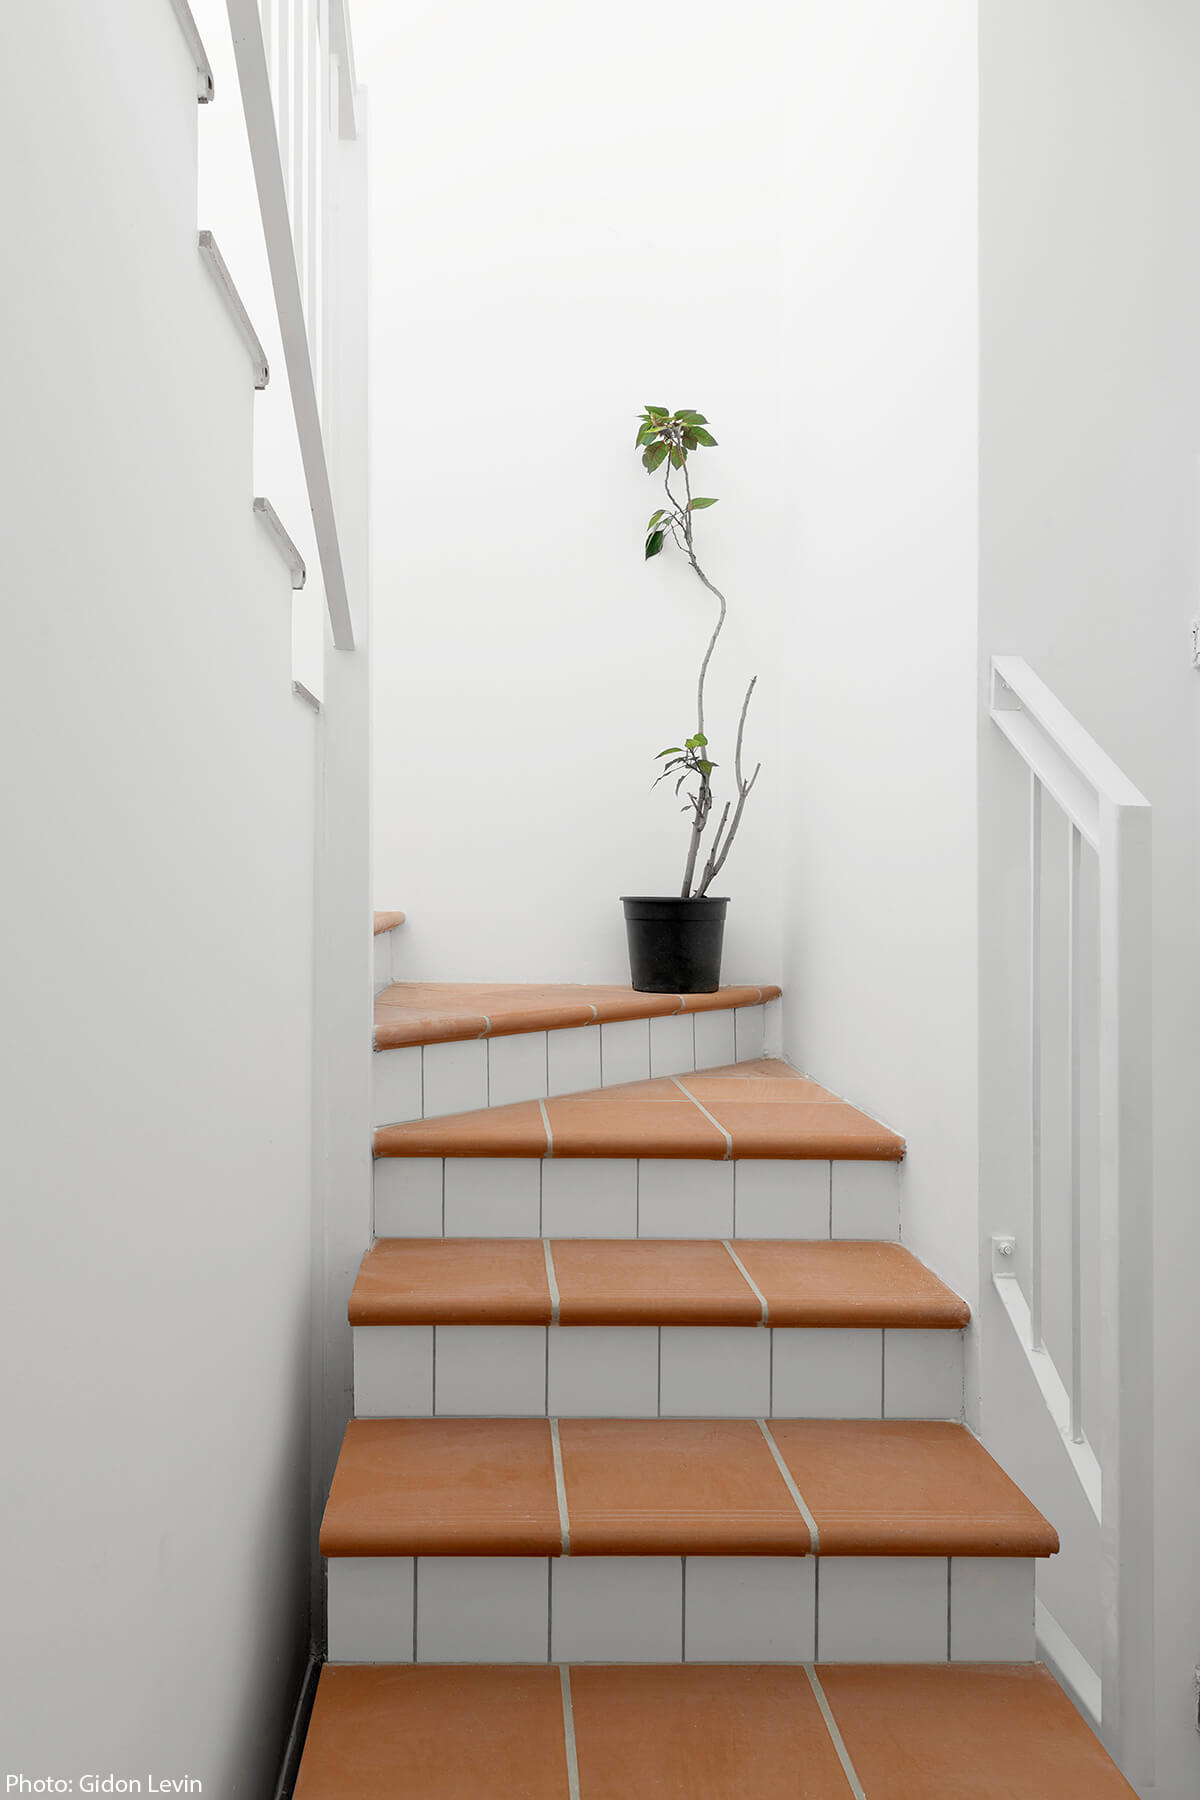 Terracotta stairs design by Jonathan Canetti Architecture & Design - Fineshmaker